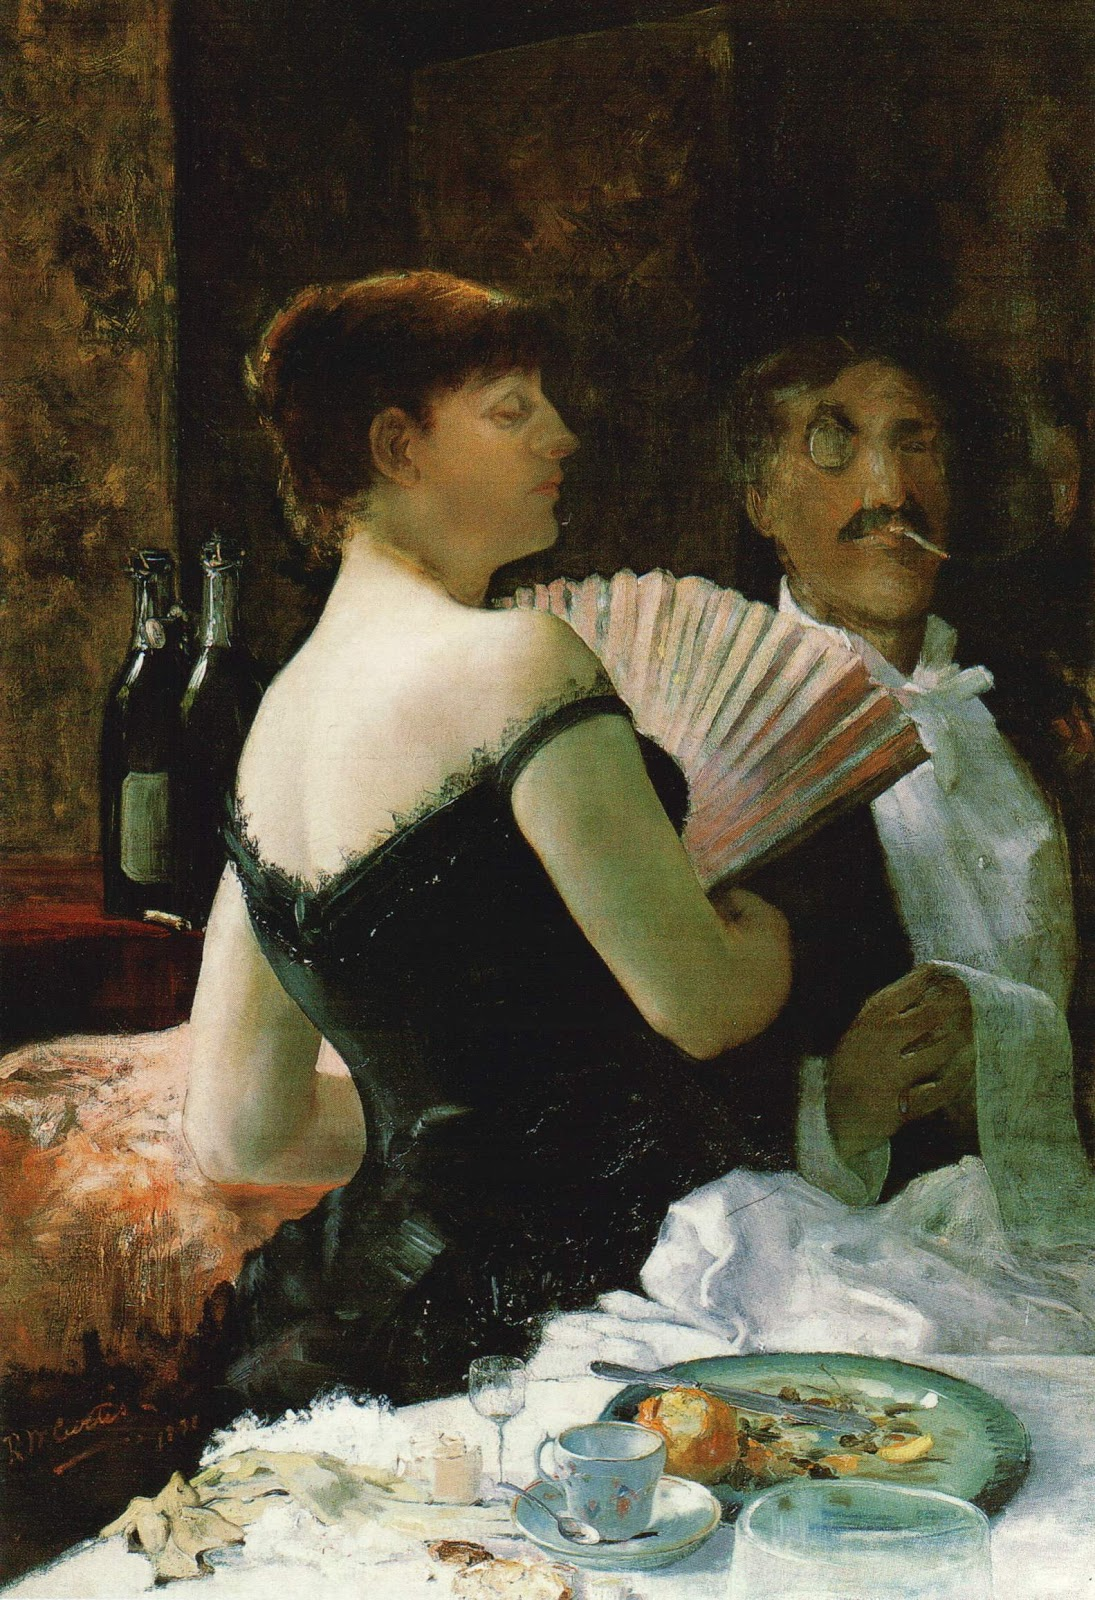 James Abbott McNeill Whistler   Tonalist painter